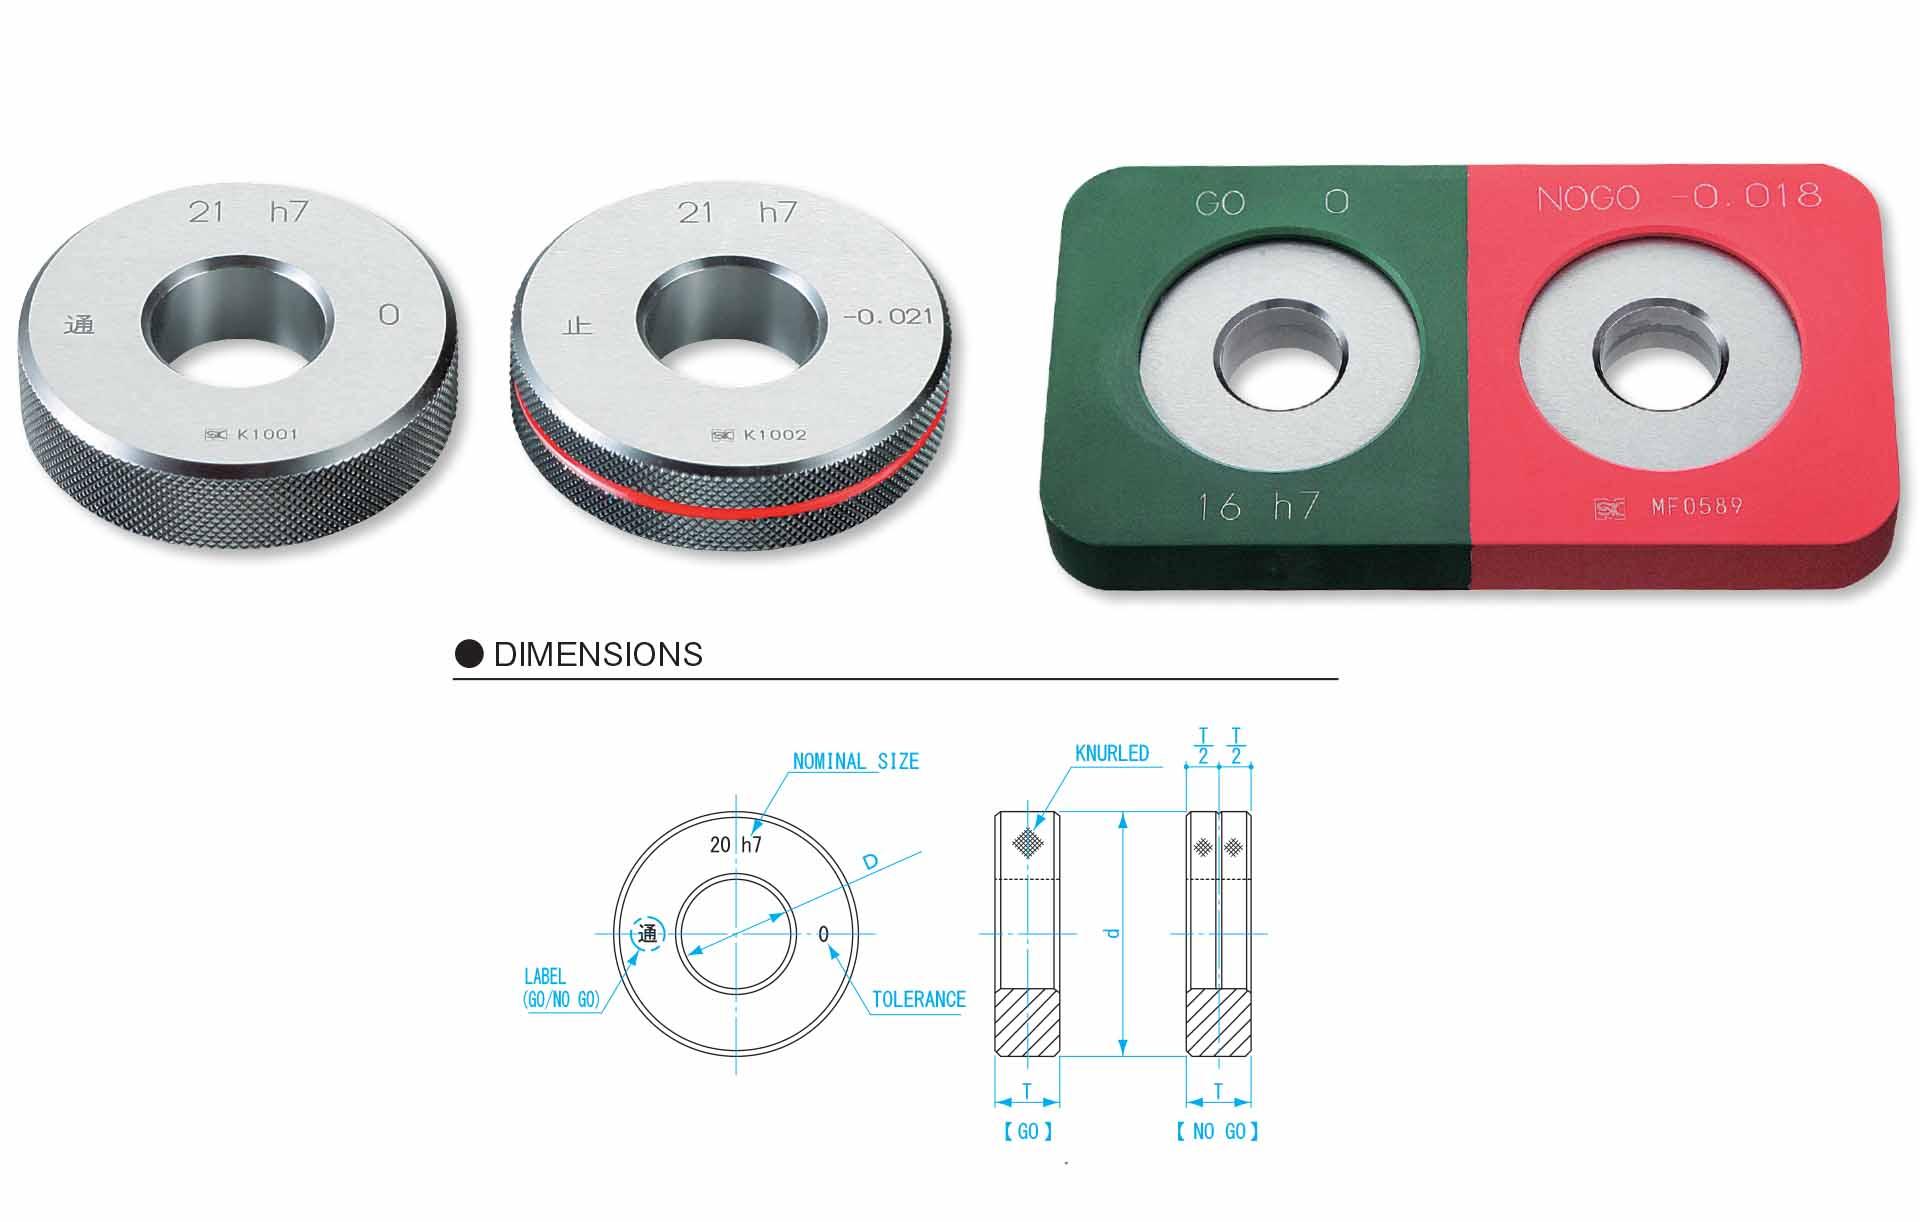 Vòng chuẩn niigataseiki đường kính 16mm Go-Nogo kiểu H7, LR16-H7